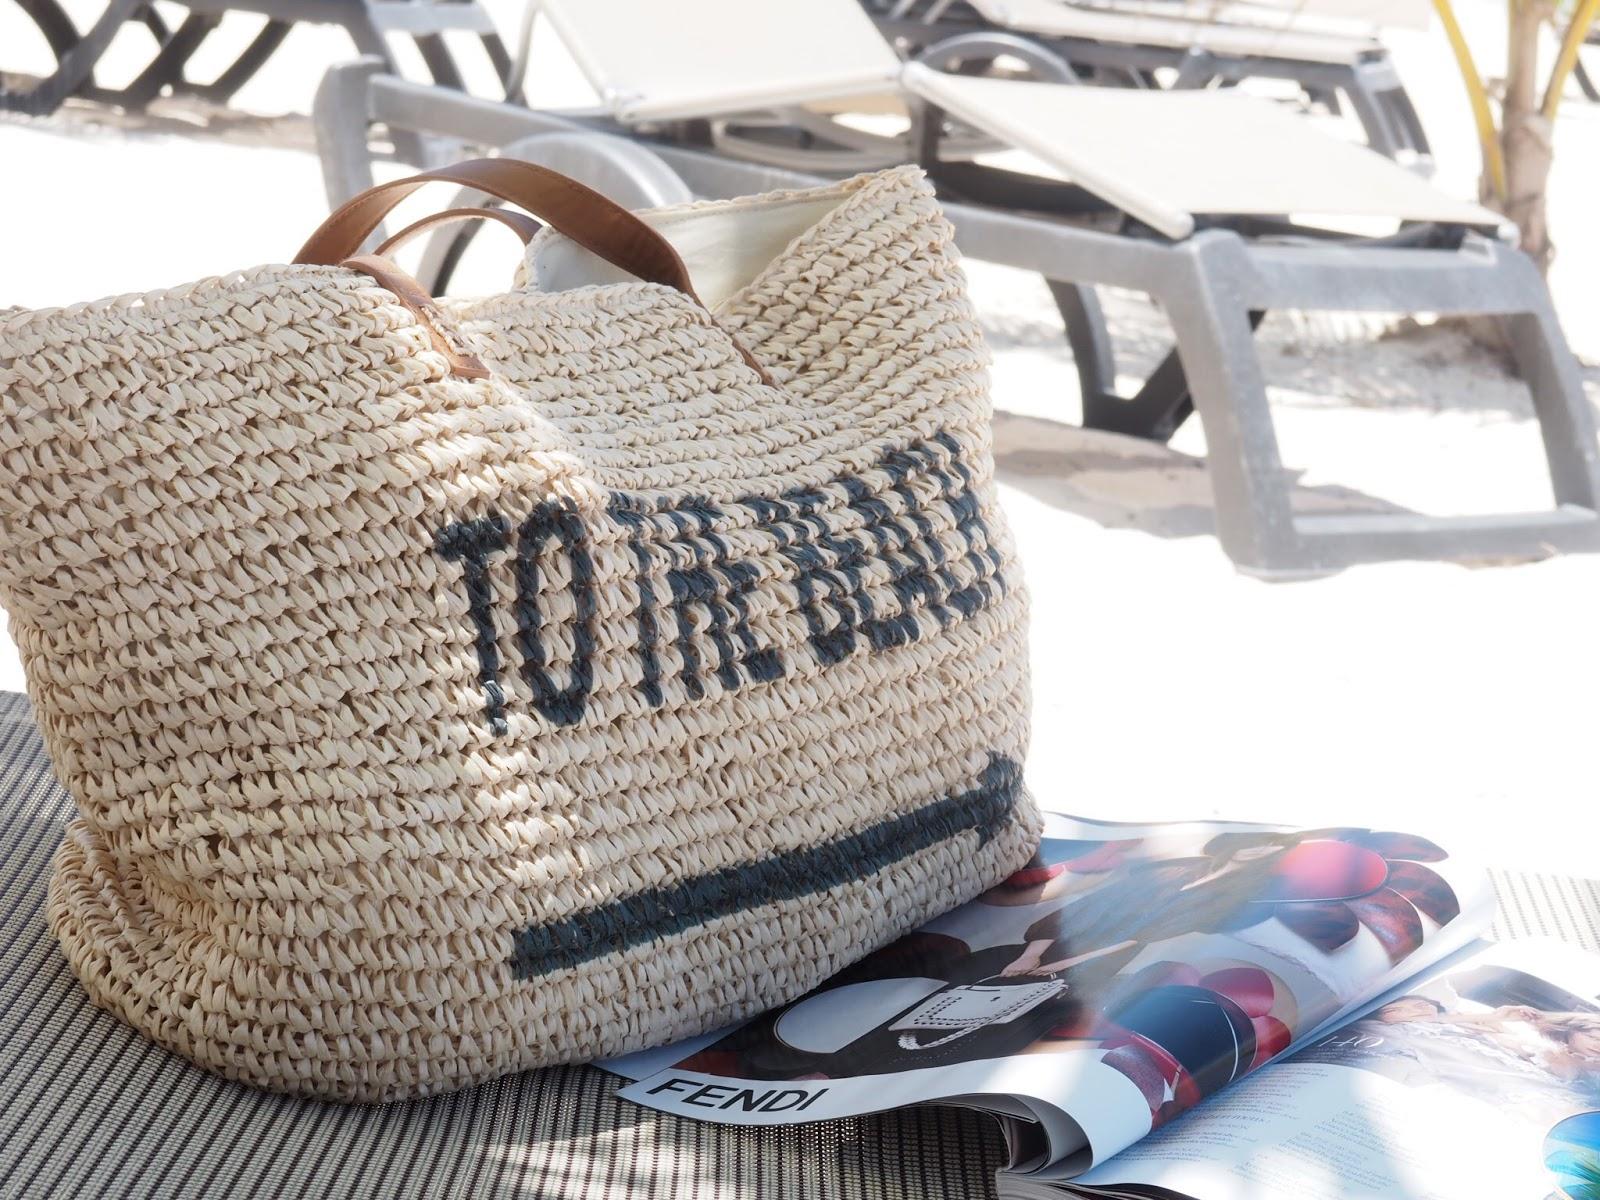 Nordstrom beach bag, www.jadore-fashionc.com